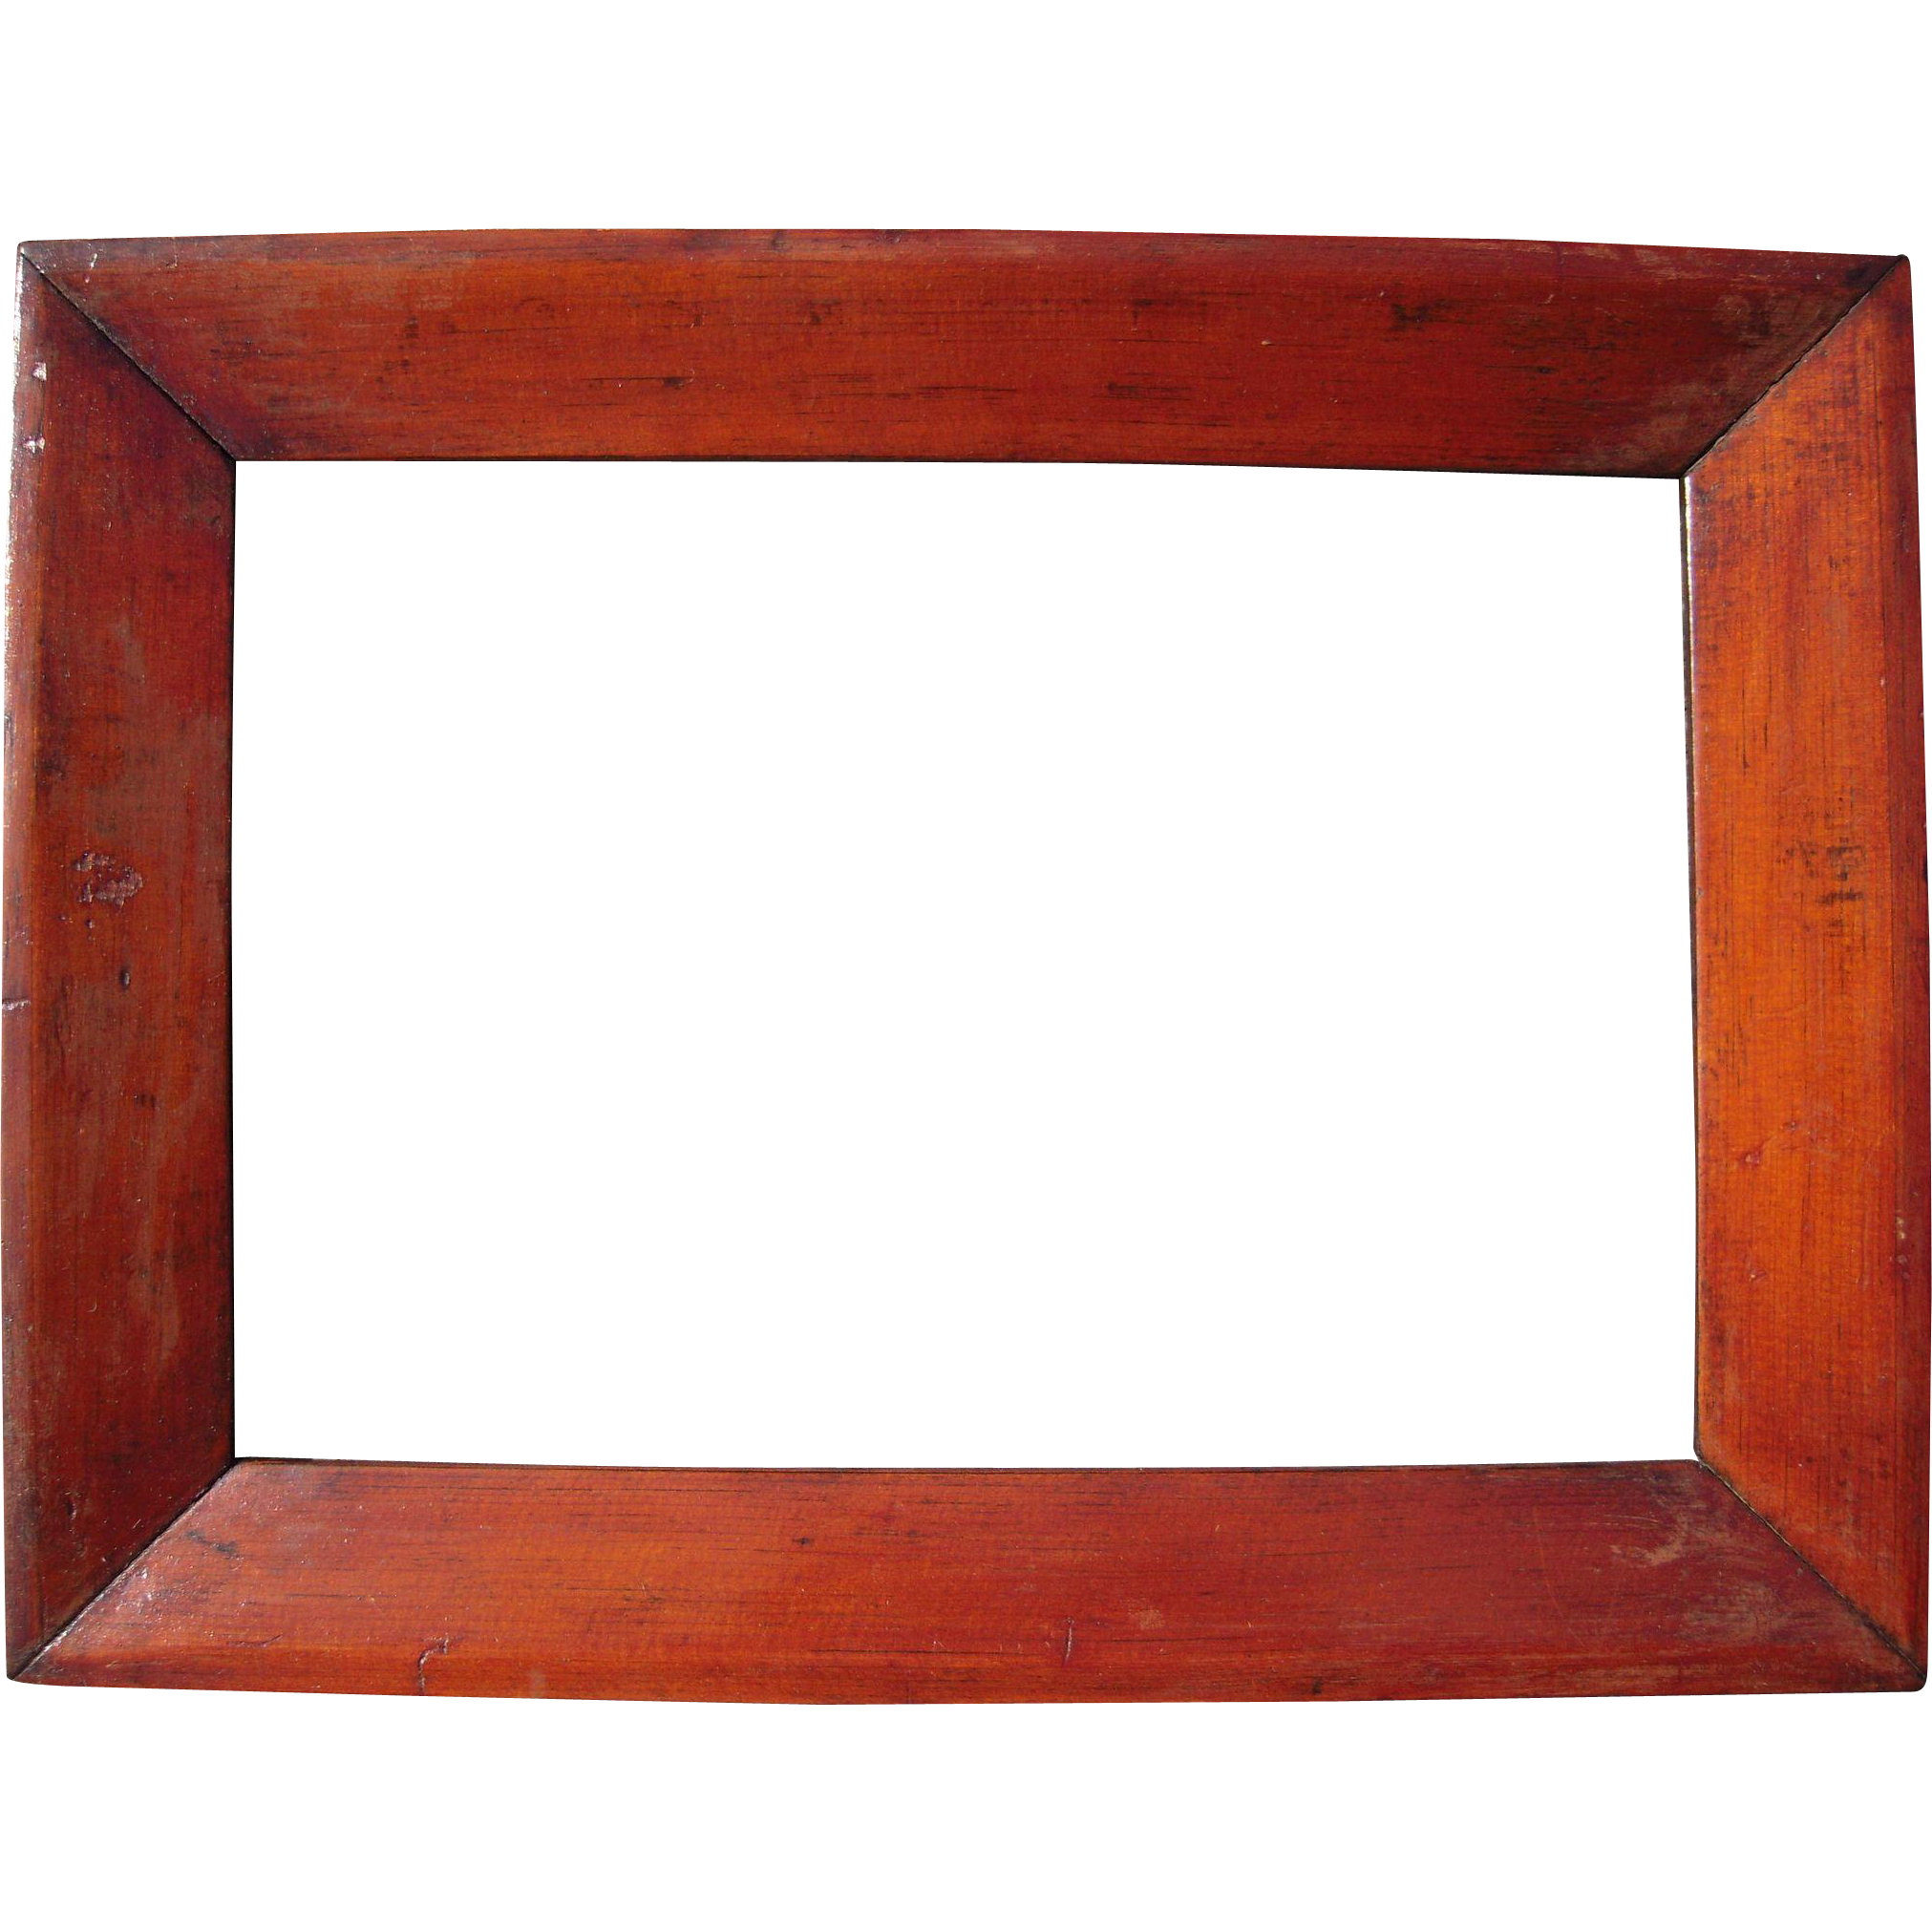 c1850 pine ogee picture frame 10 x 14 from bluesprucerugsandantiques on ruby lane. Black Bedroom Furniture Sets. Home Design Ideas